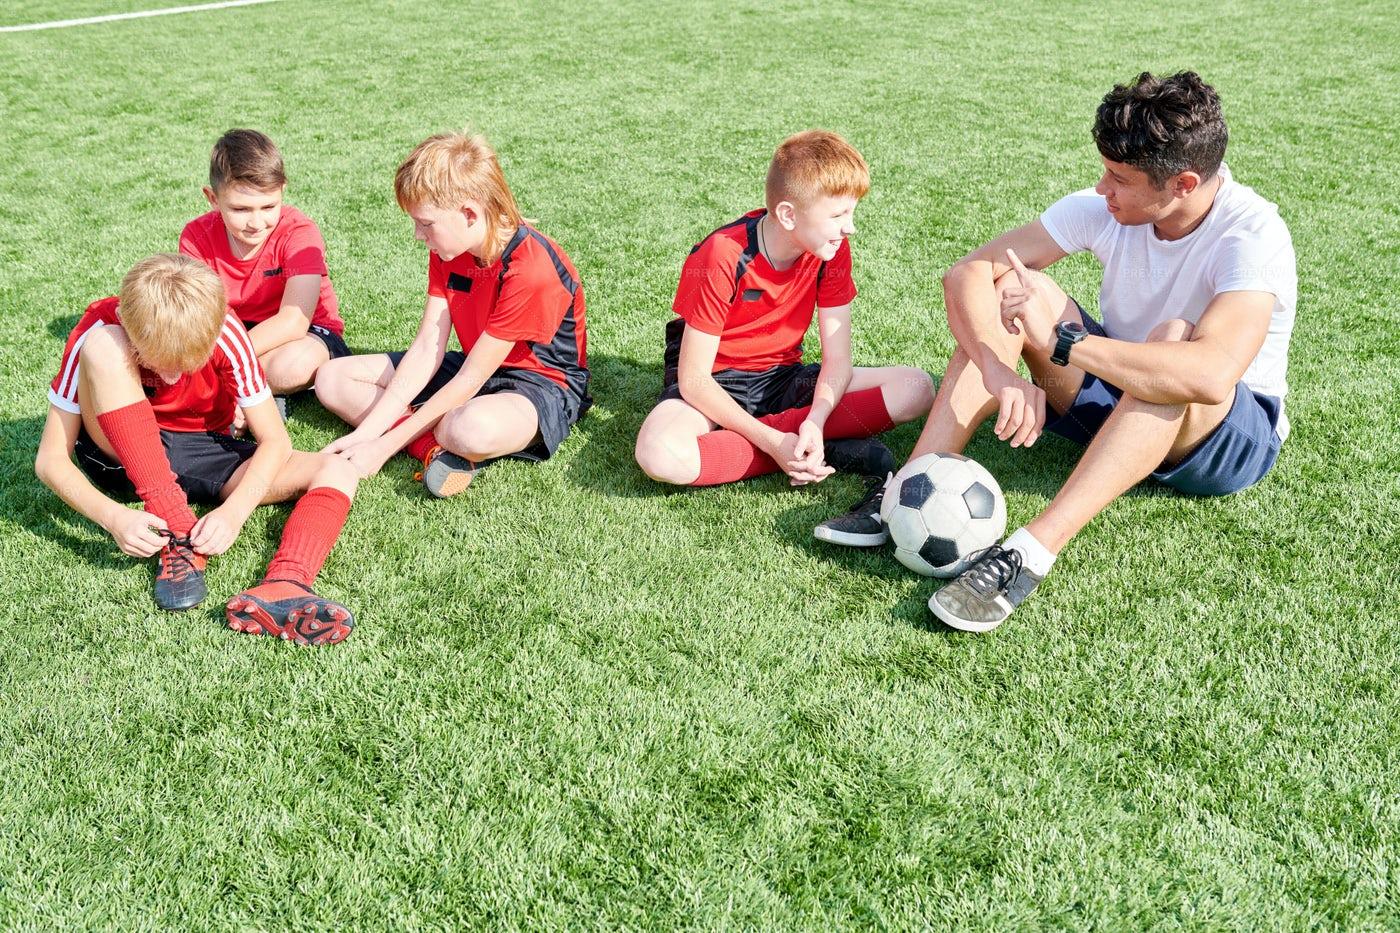 Junior Football Team Resting In...: Stock Photos